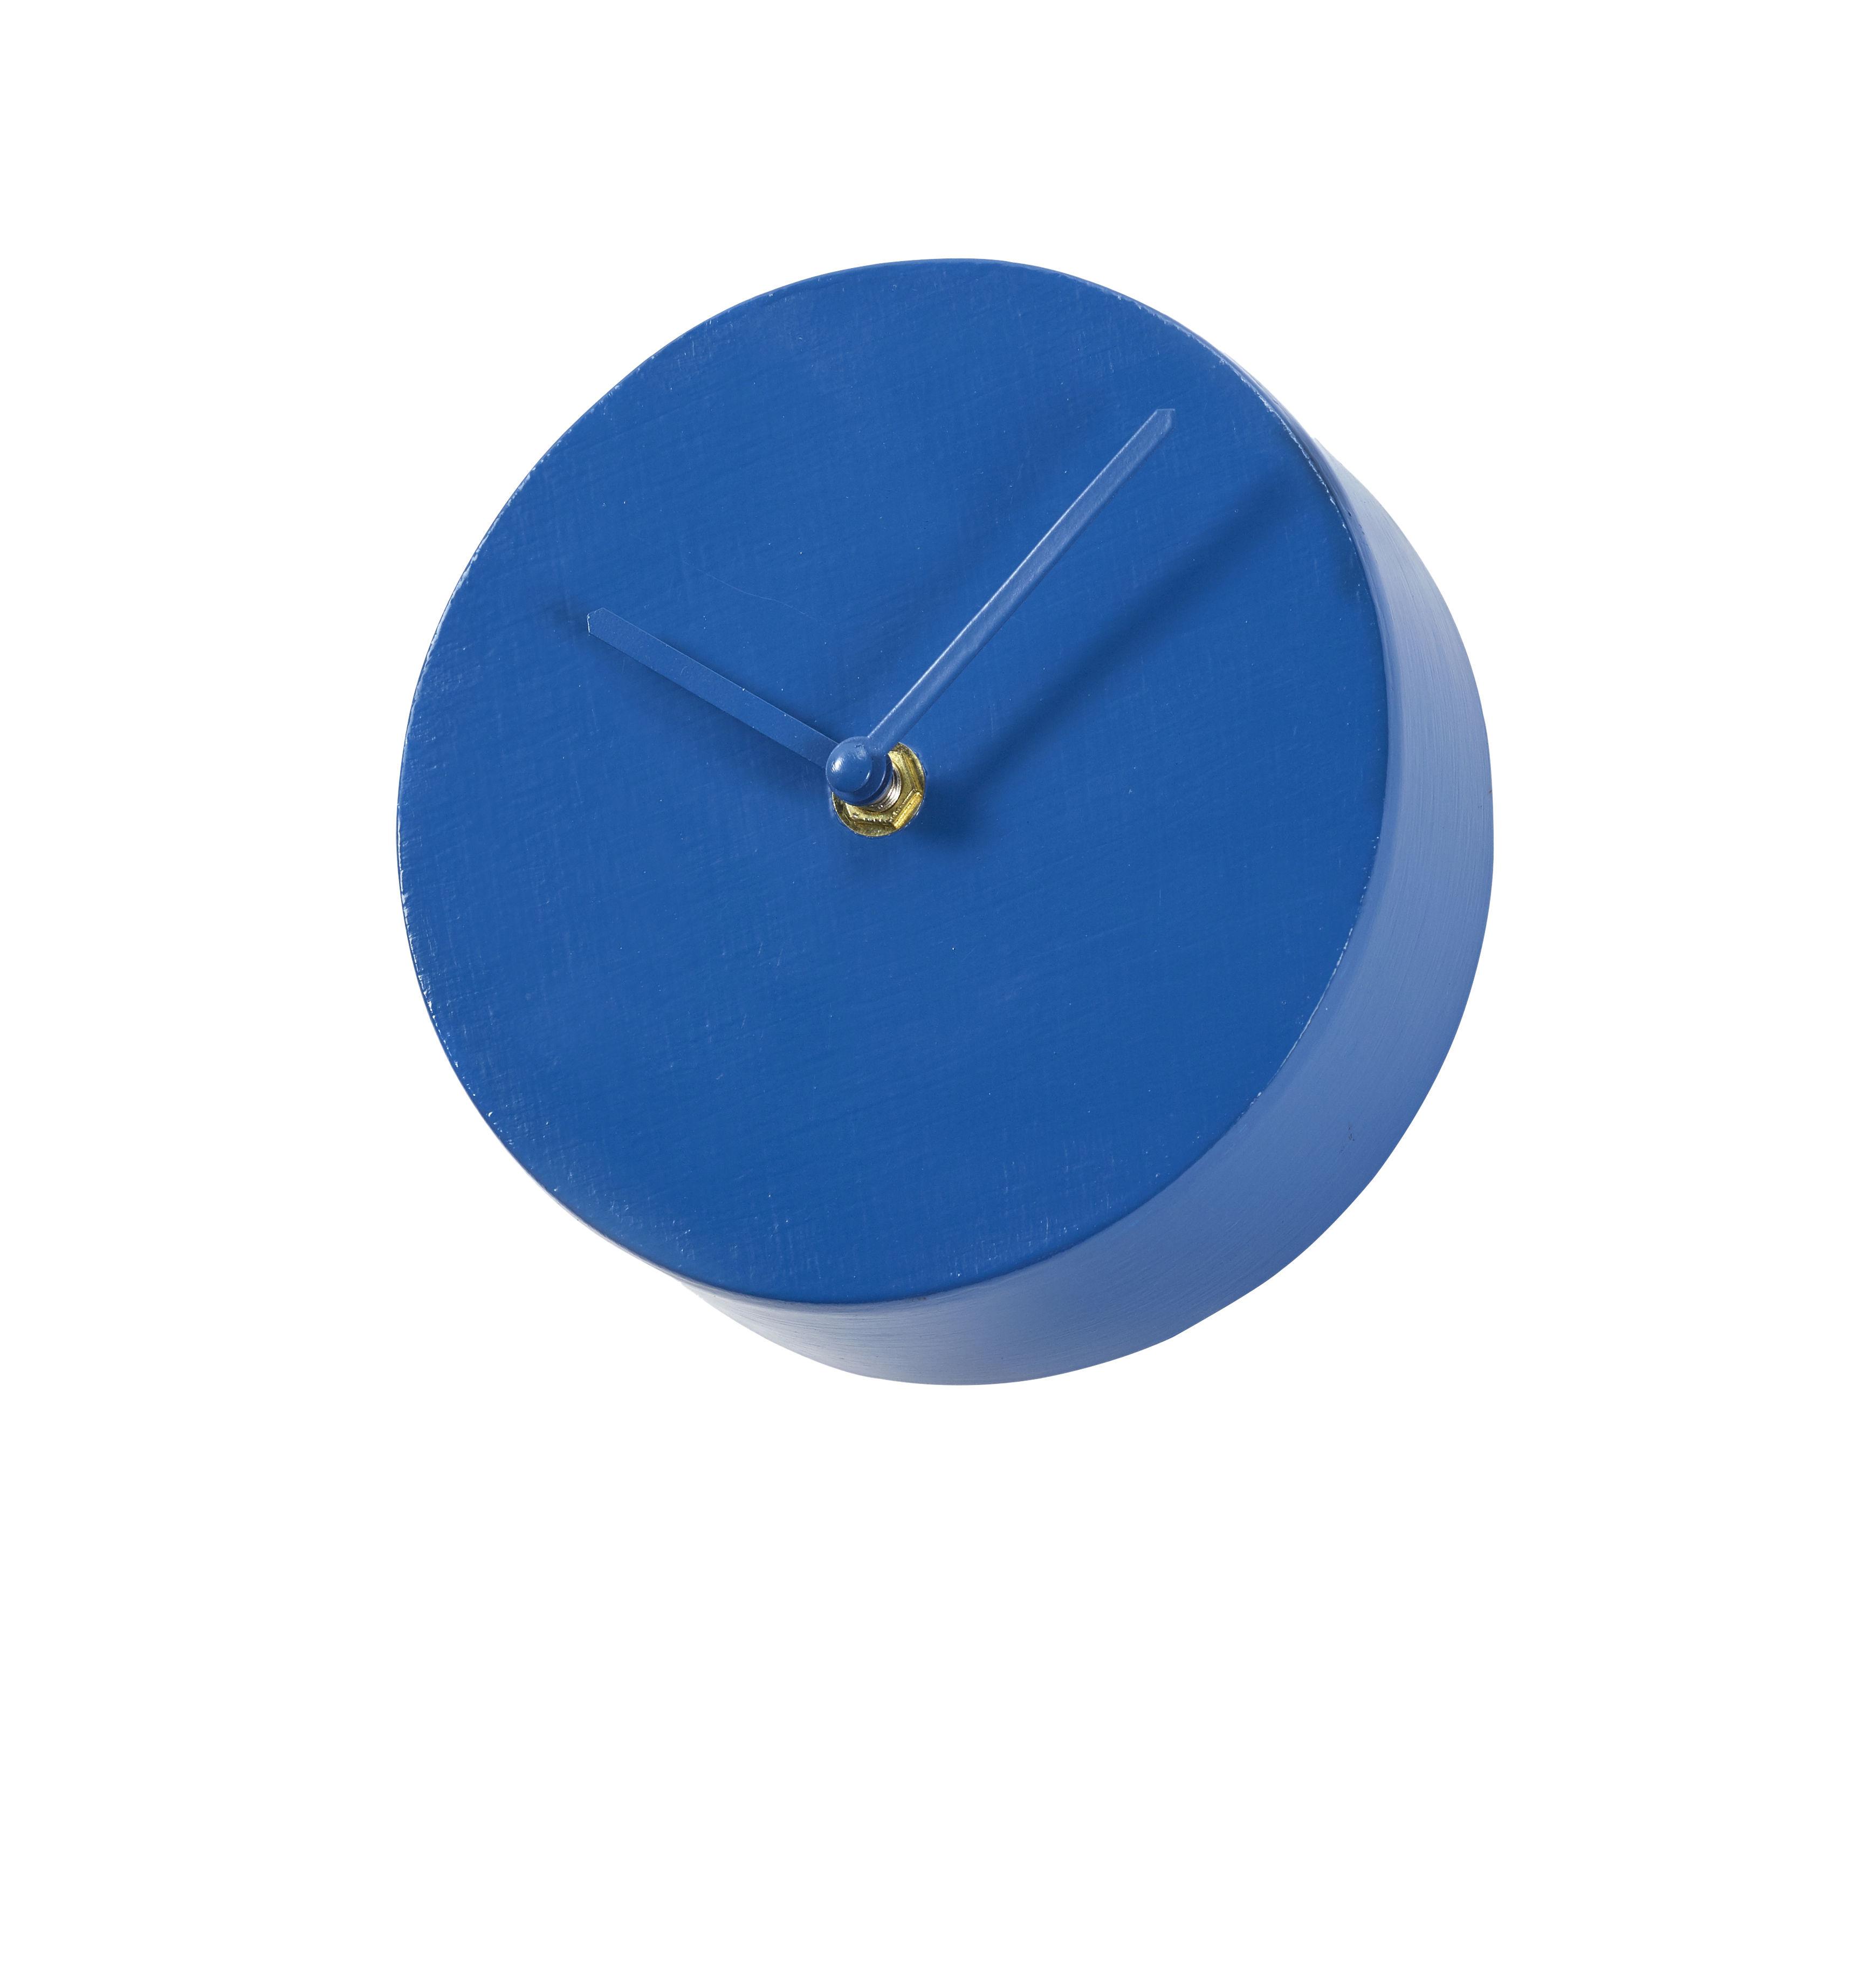 Decoration - Wall Clocks - Ronde Wall clock - / Ø 15 cm by Serax - Round / Californian blue - Painted metal